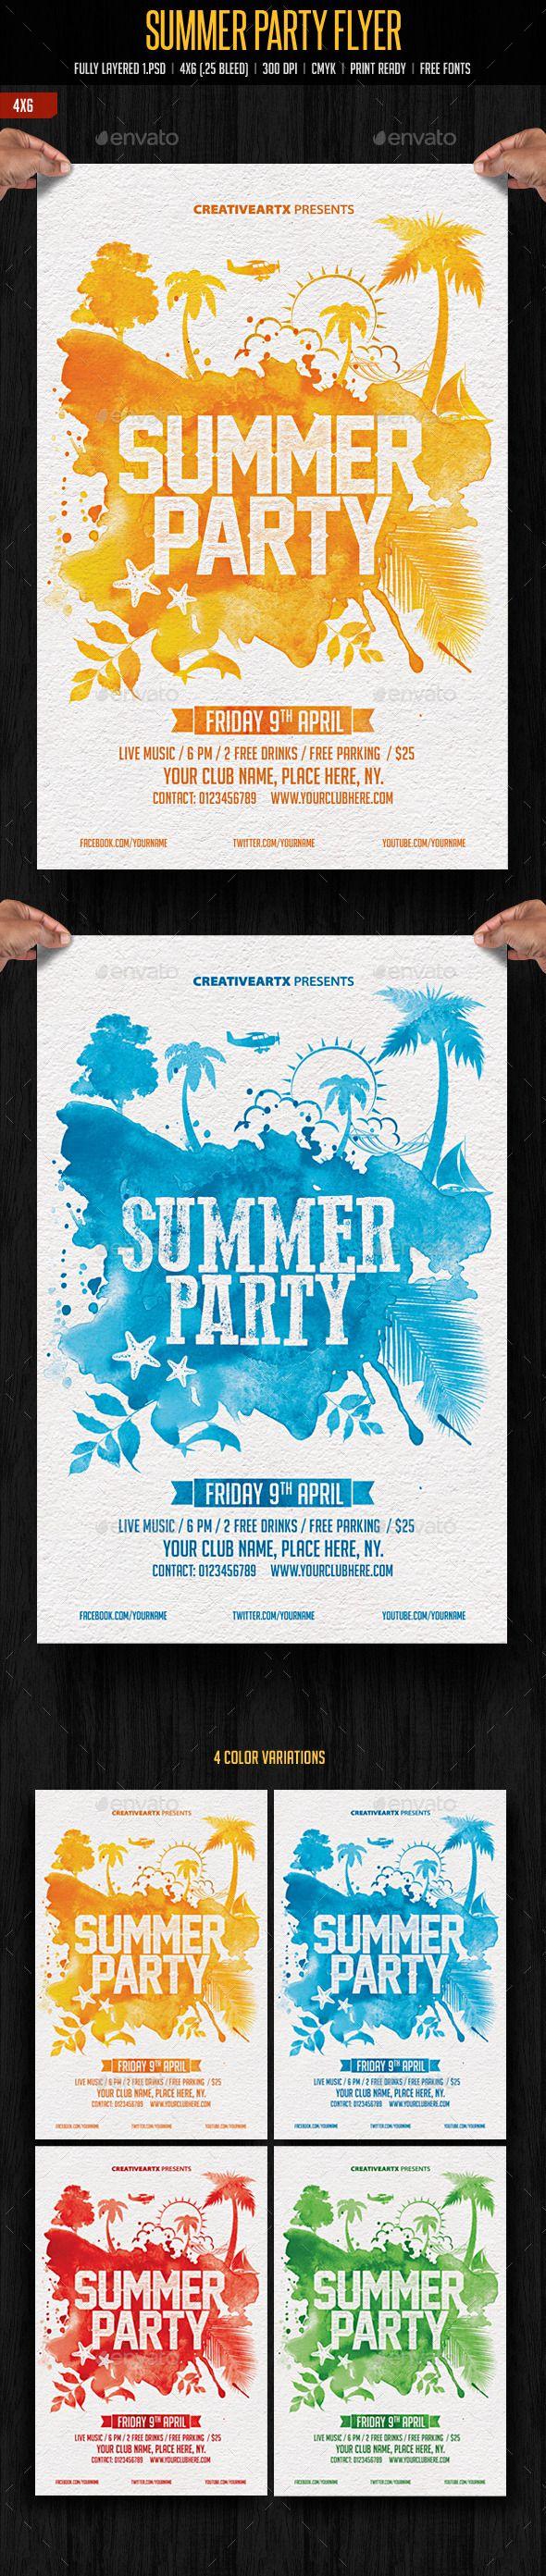 Summer Party Flyer Tempalte #design #summer Download: graphicriver.net/...